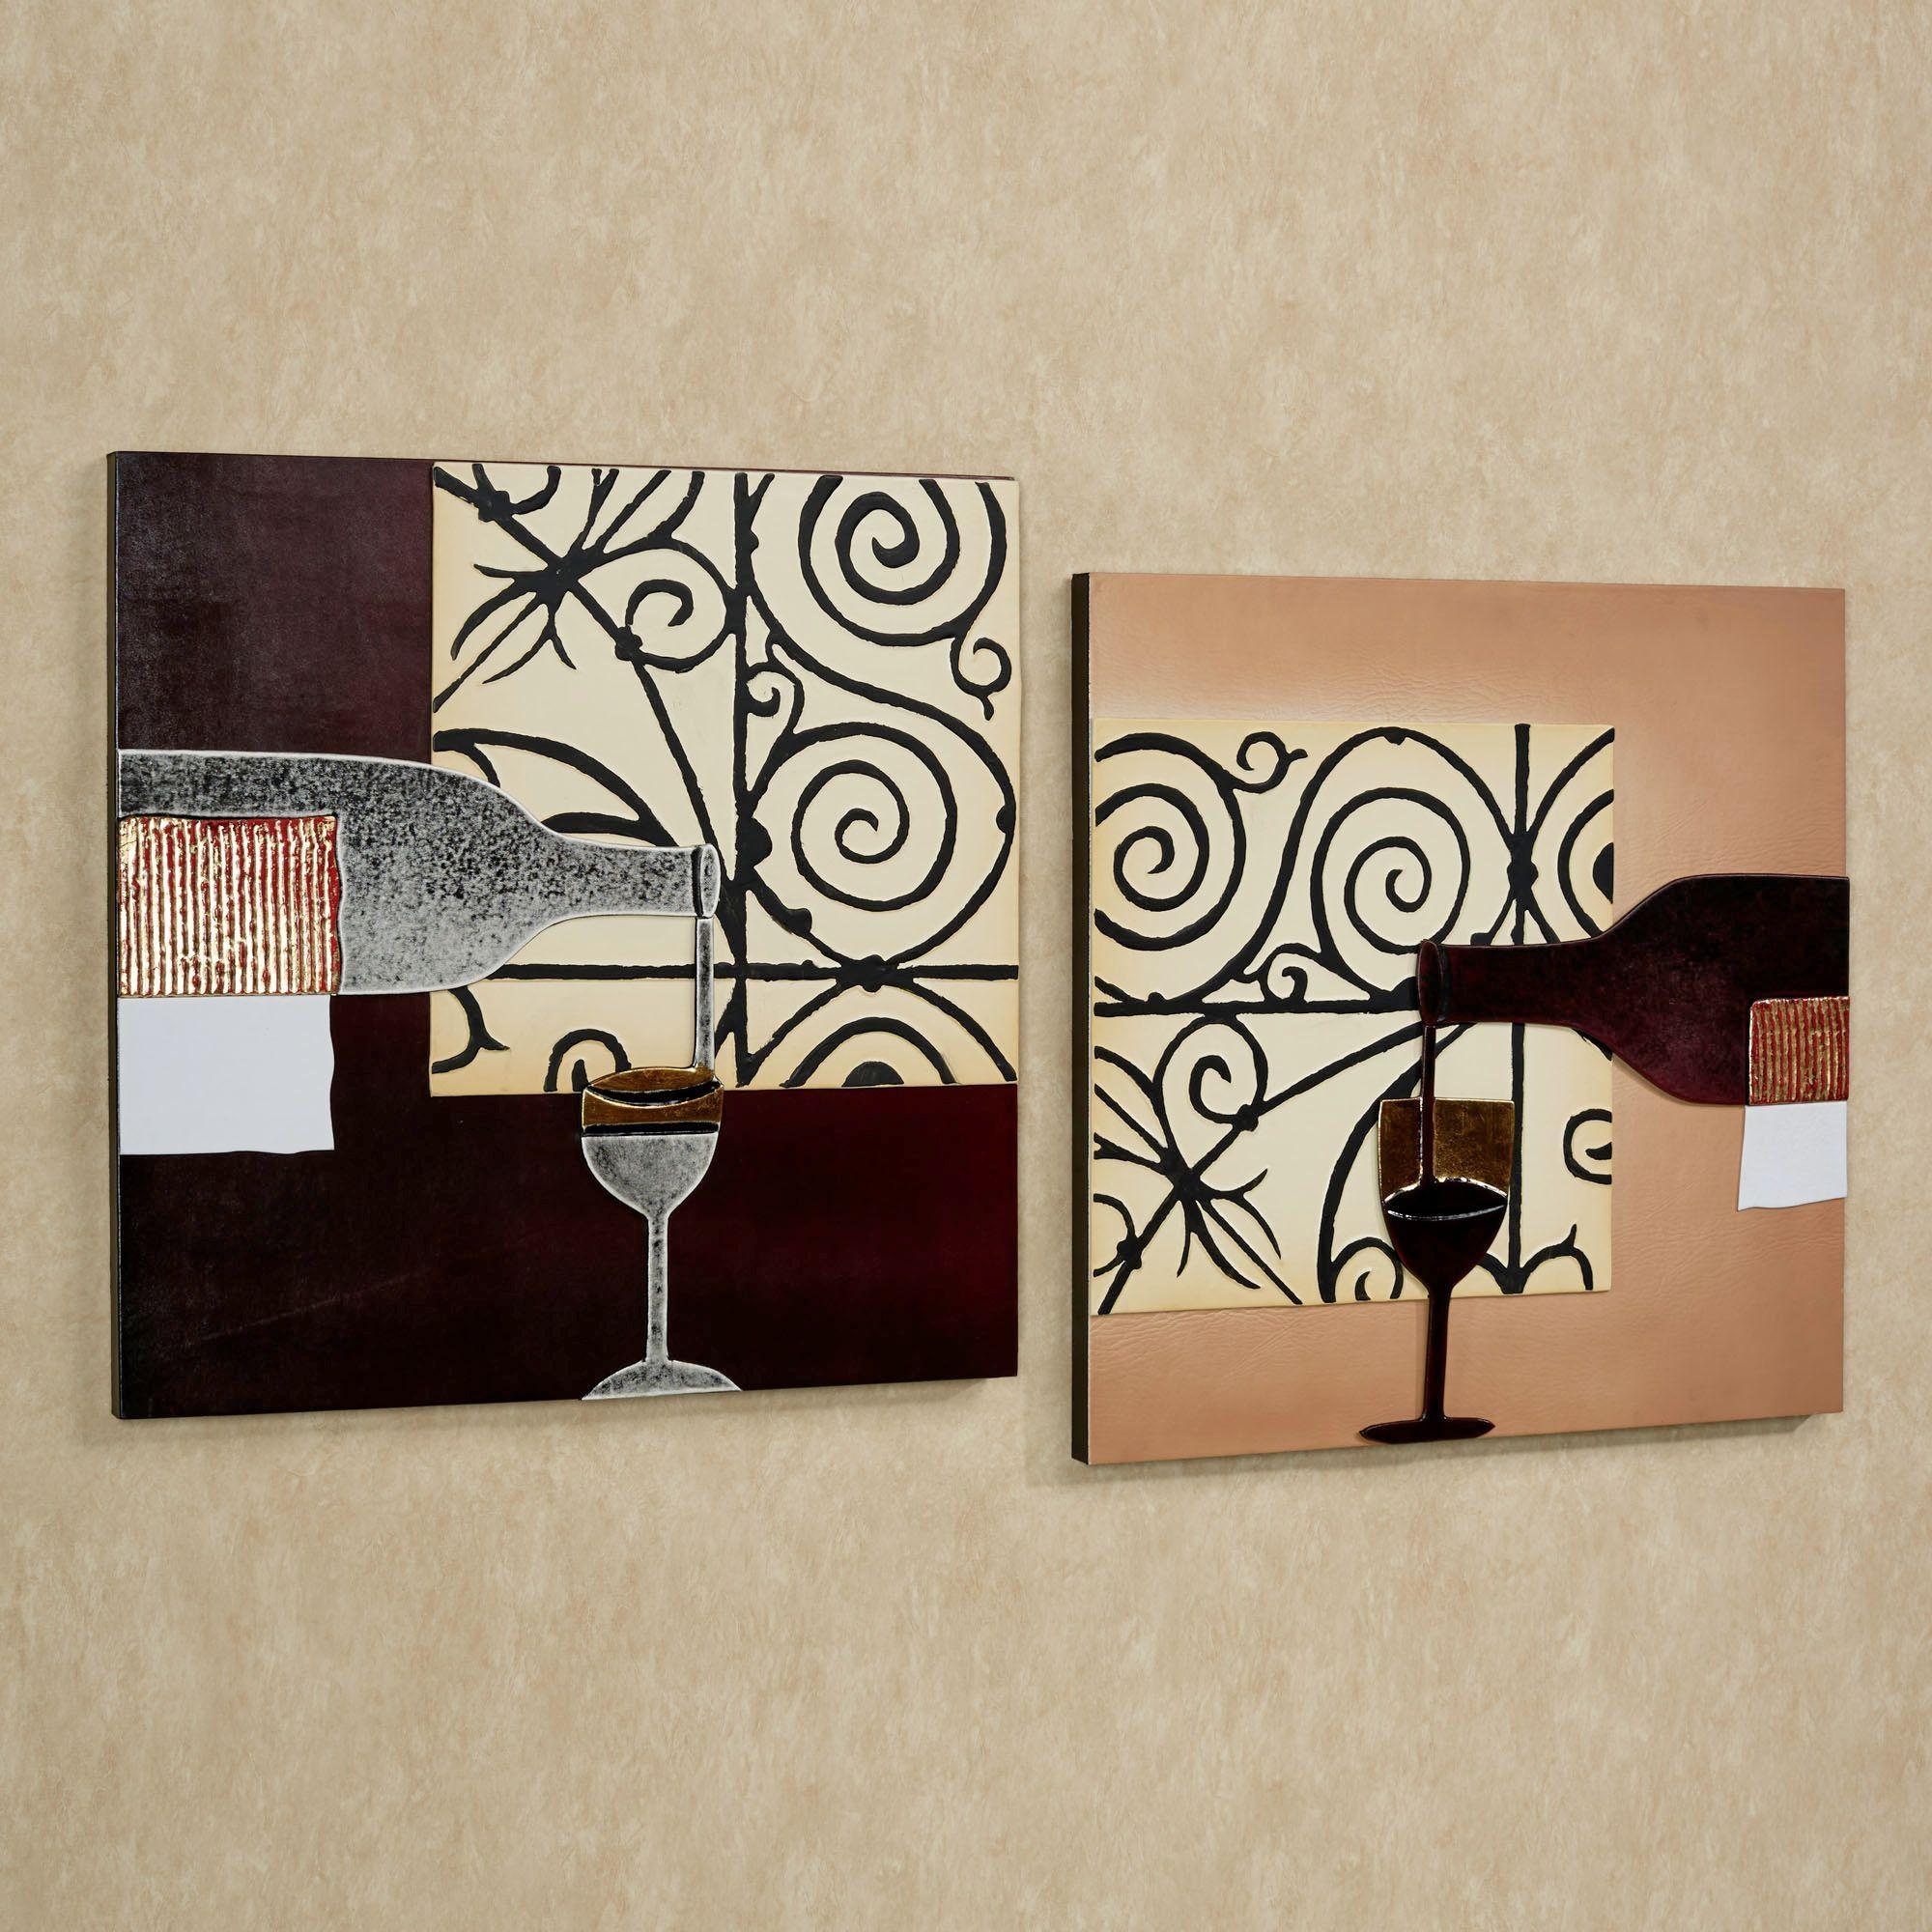 Kitchen Wall Decor Sets   Kitchen Decor Design Ideas in Kitchen Wall Art Sets